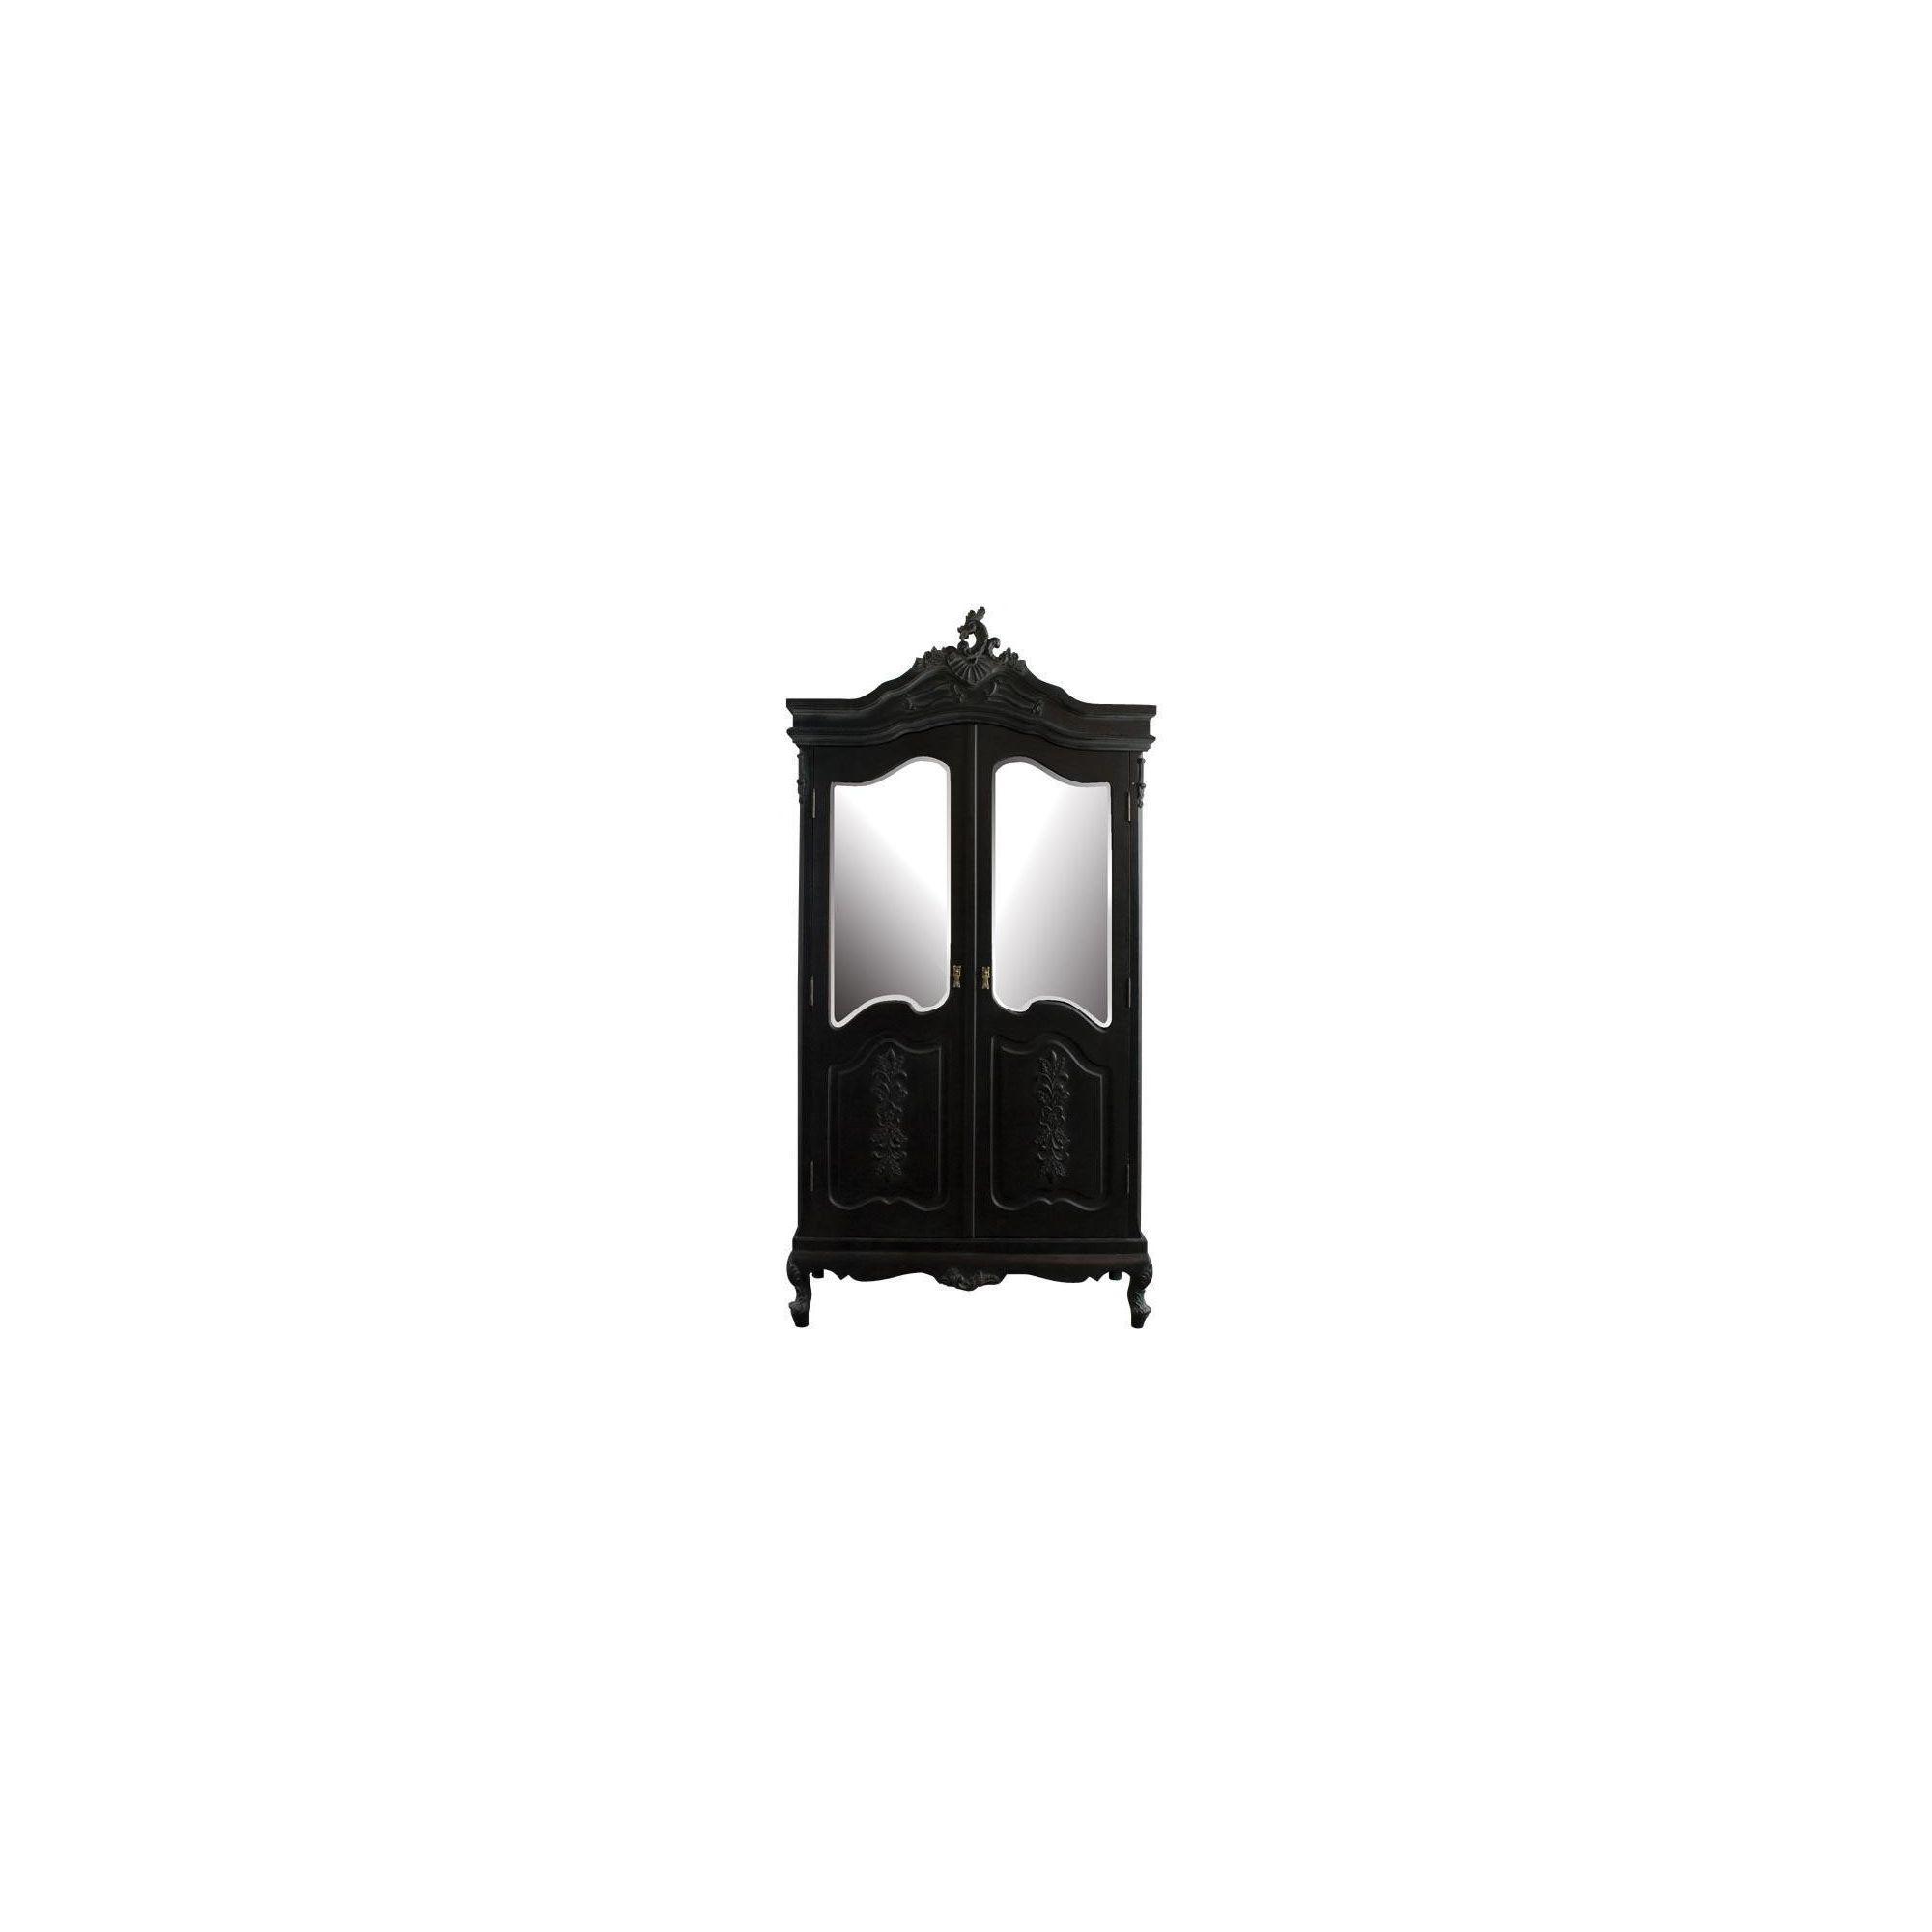 Alterton Furniture Noir Wardrobe at Tesco Direct